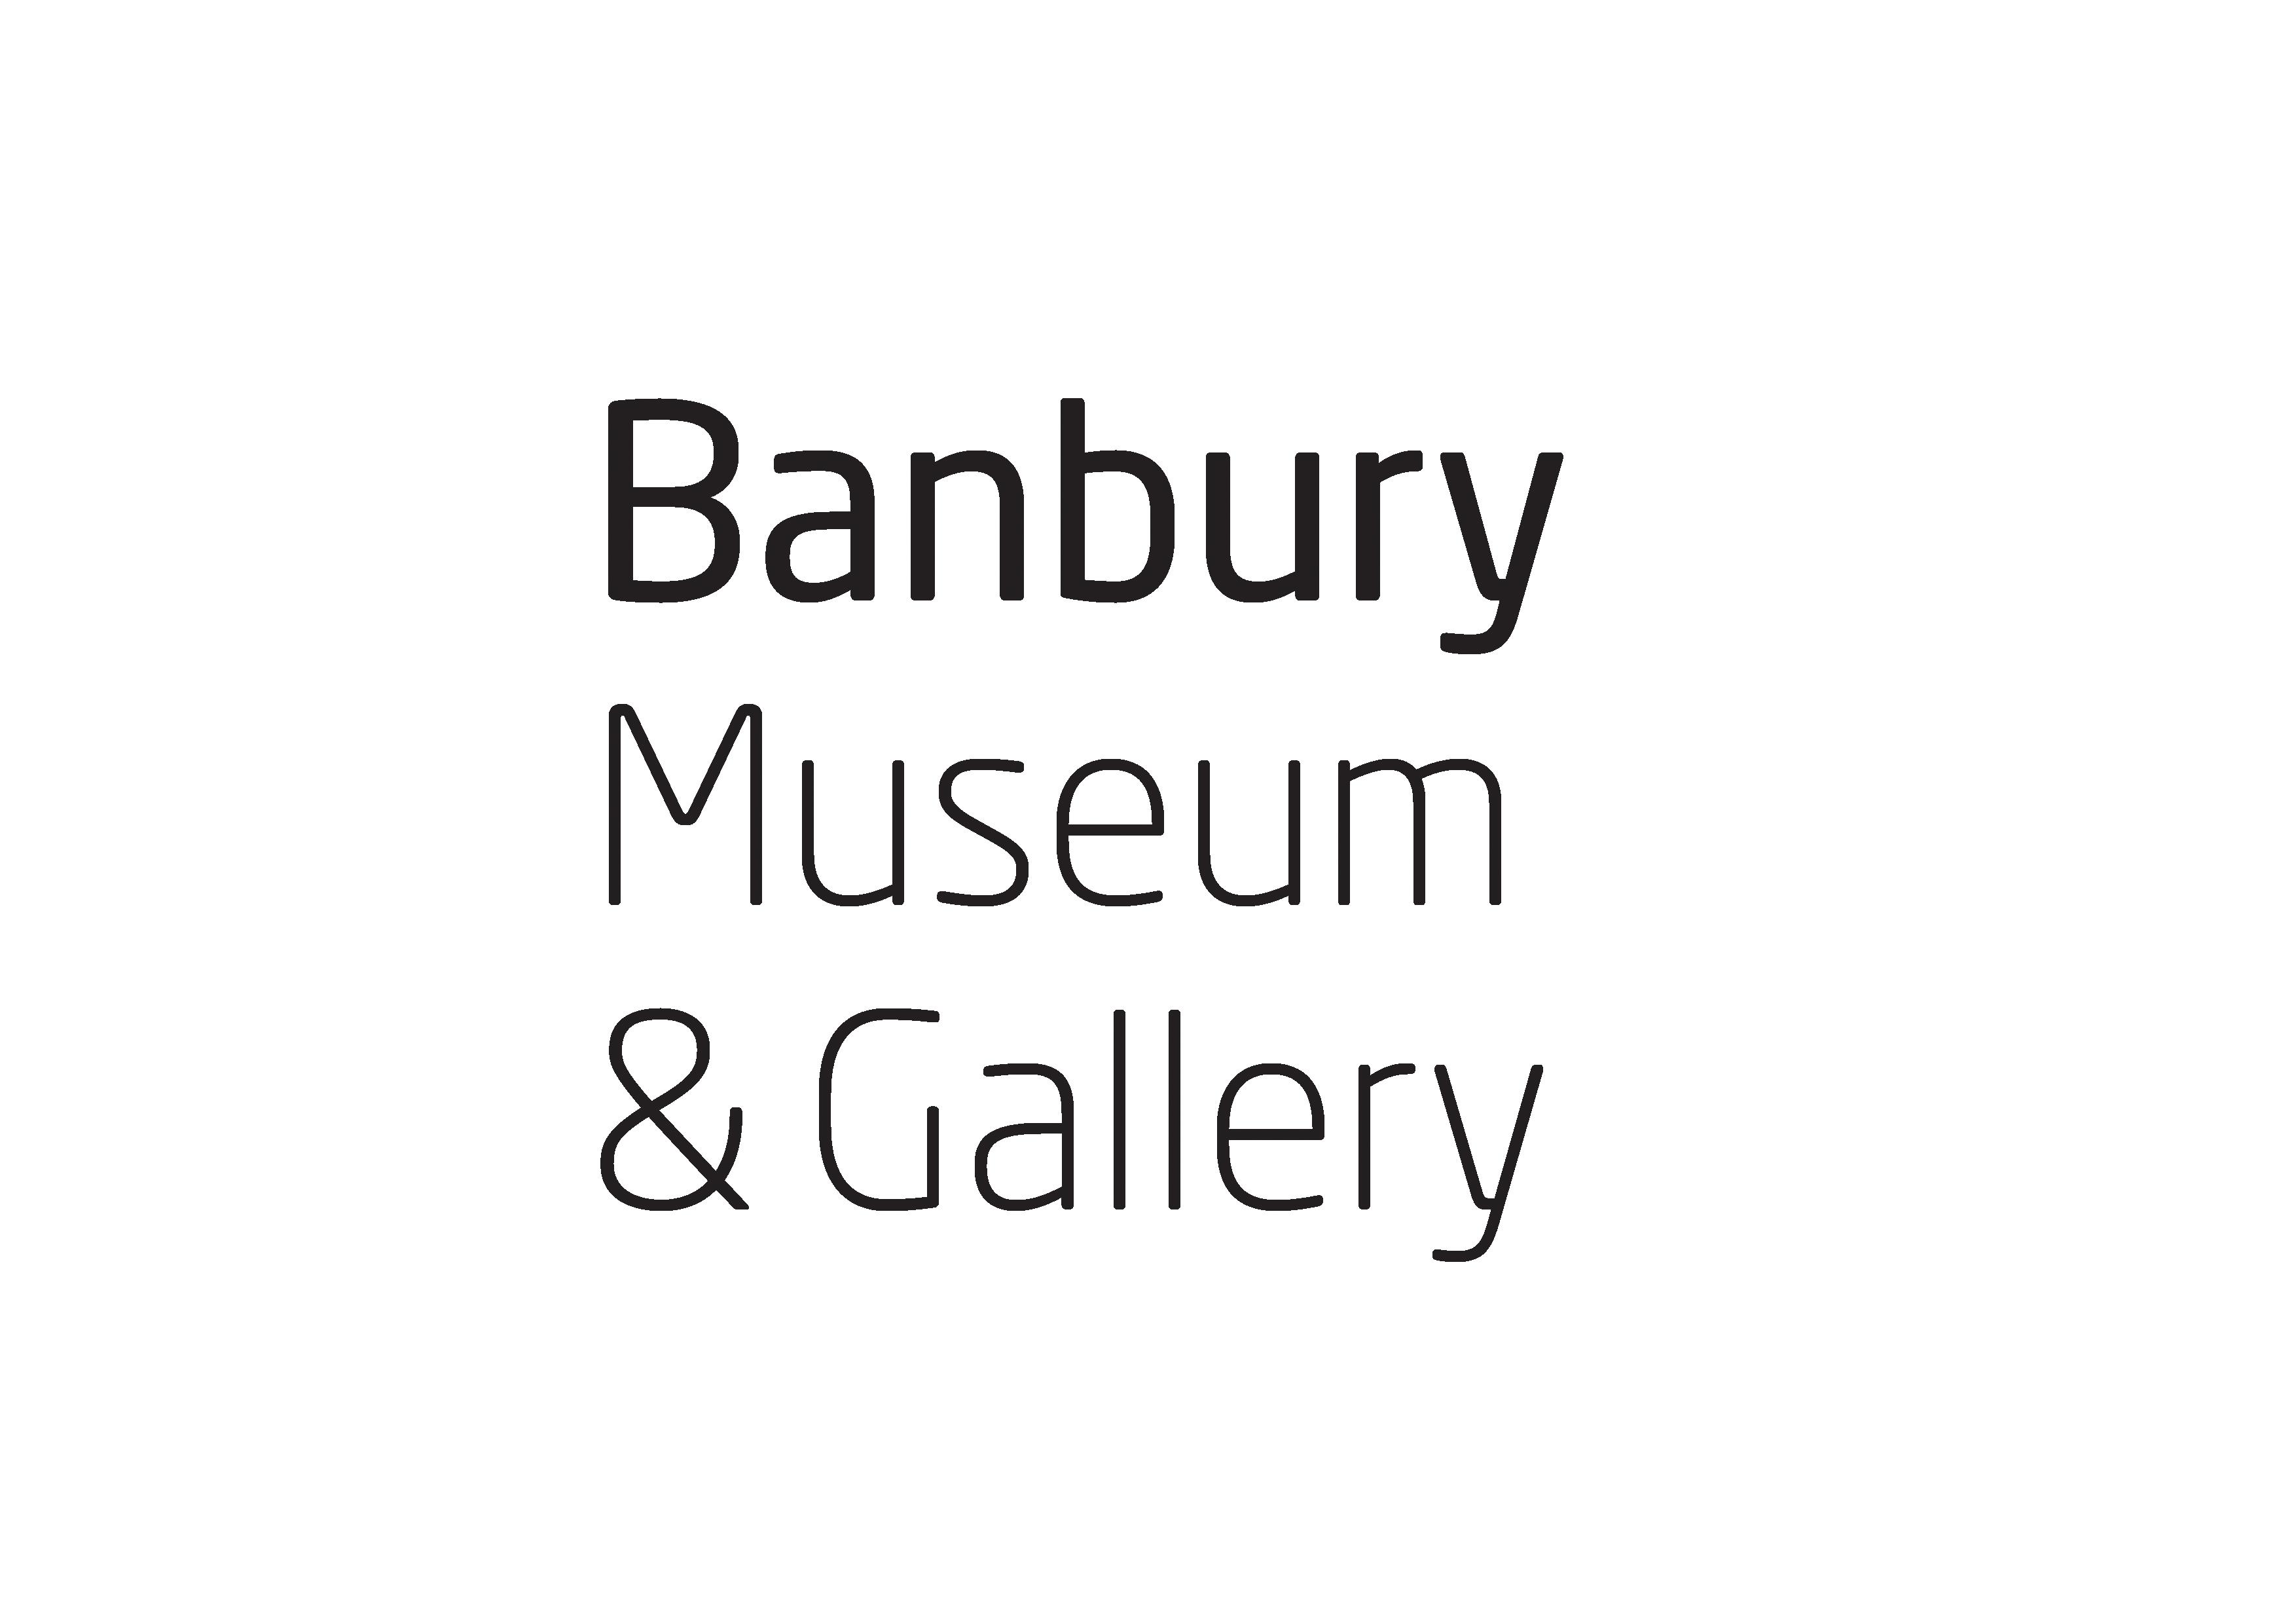 Banbury Museum & Gallery's logo